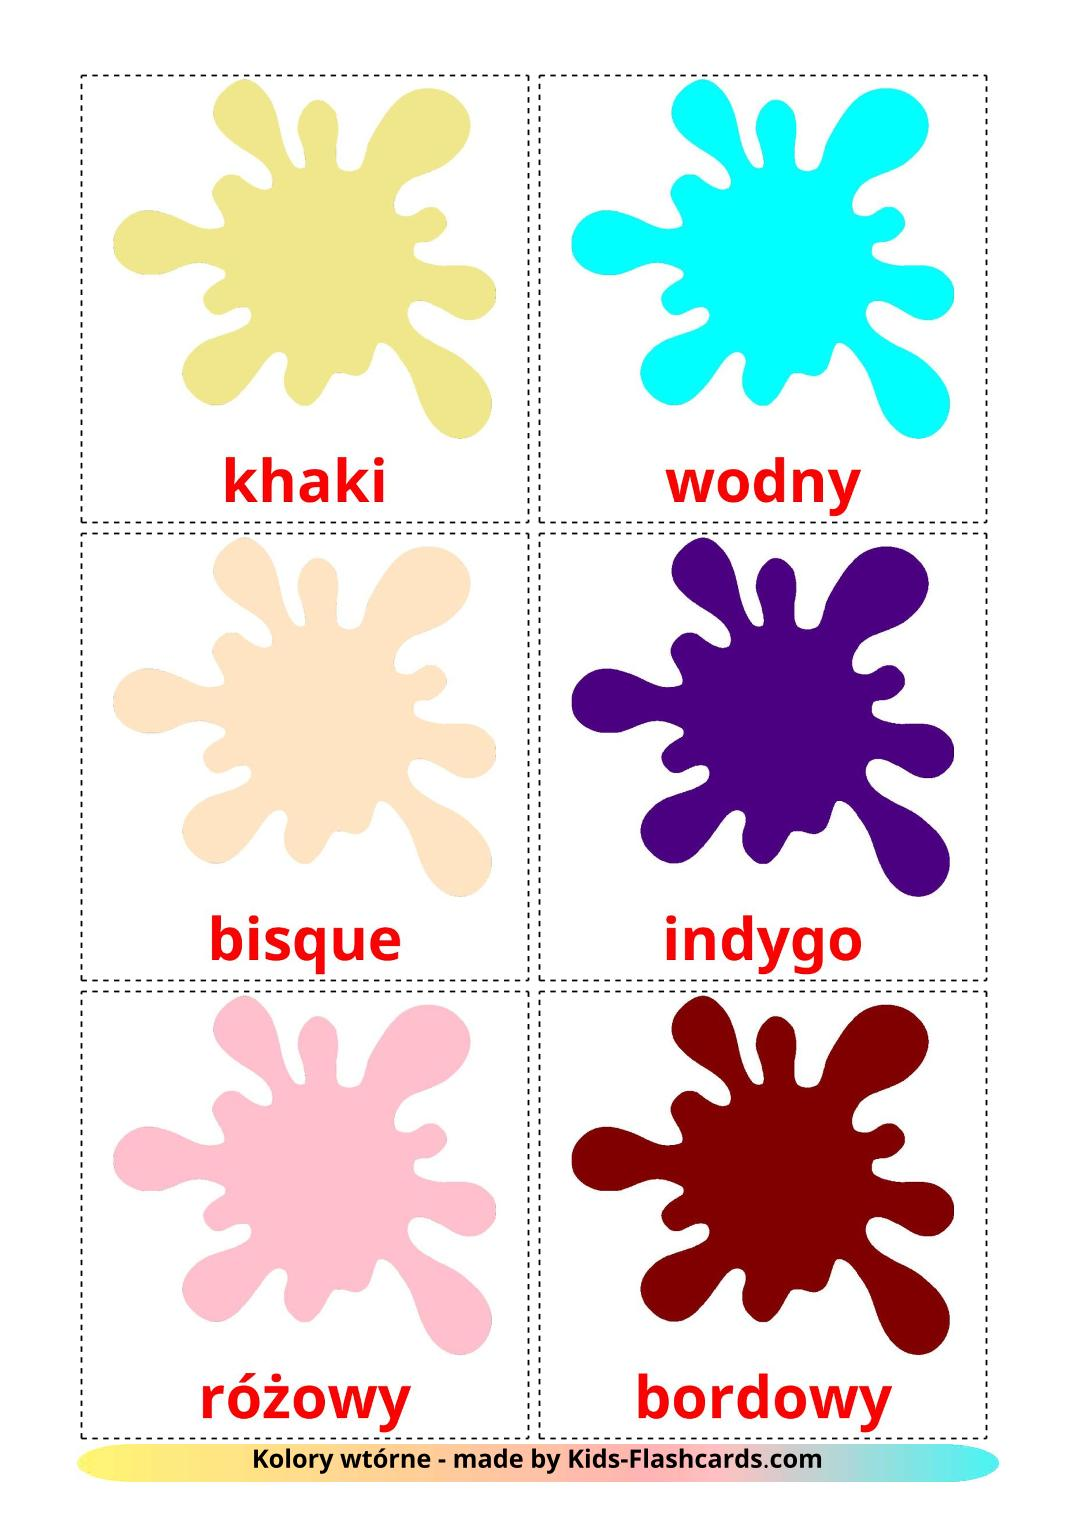 Secondary colors - 20 Free Printable polish Flashcards